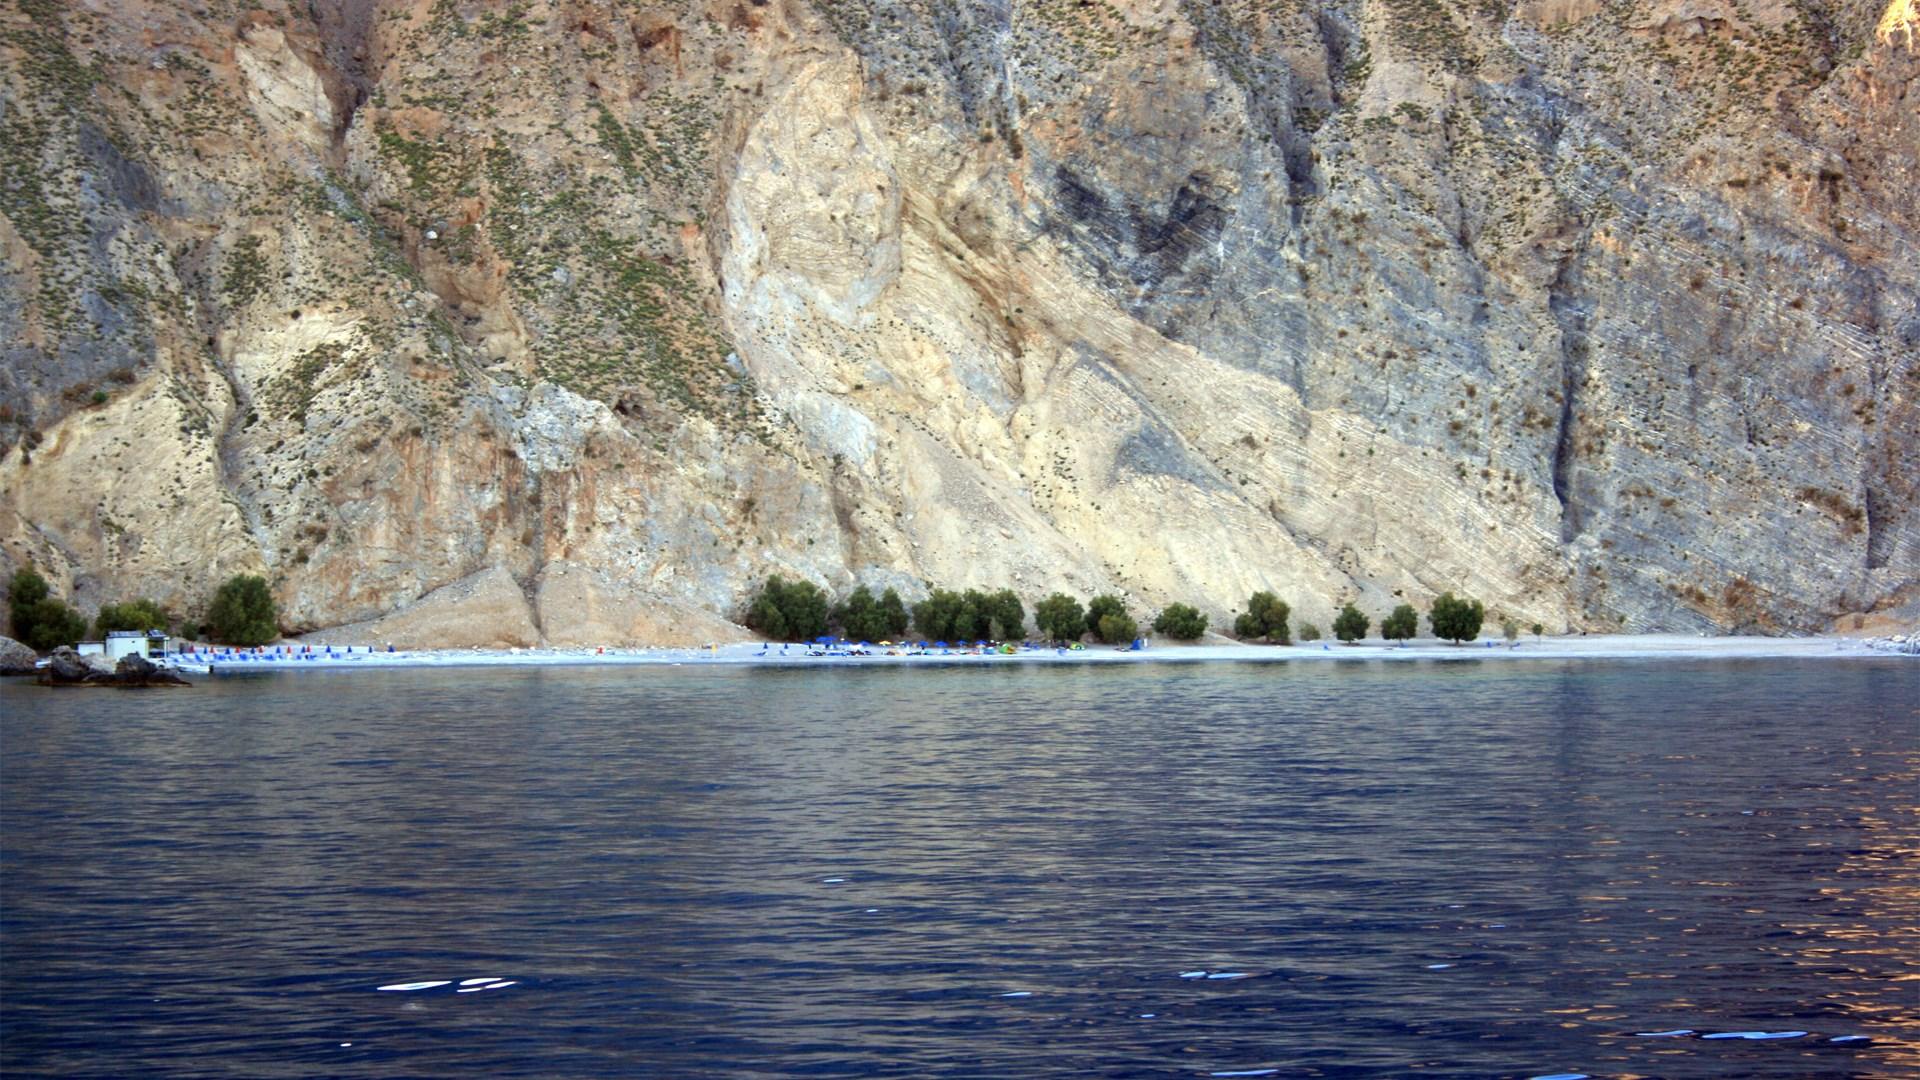 Glika Nera Beach, Sfakia-Crete | 10 Jul 2016  | Alargo